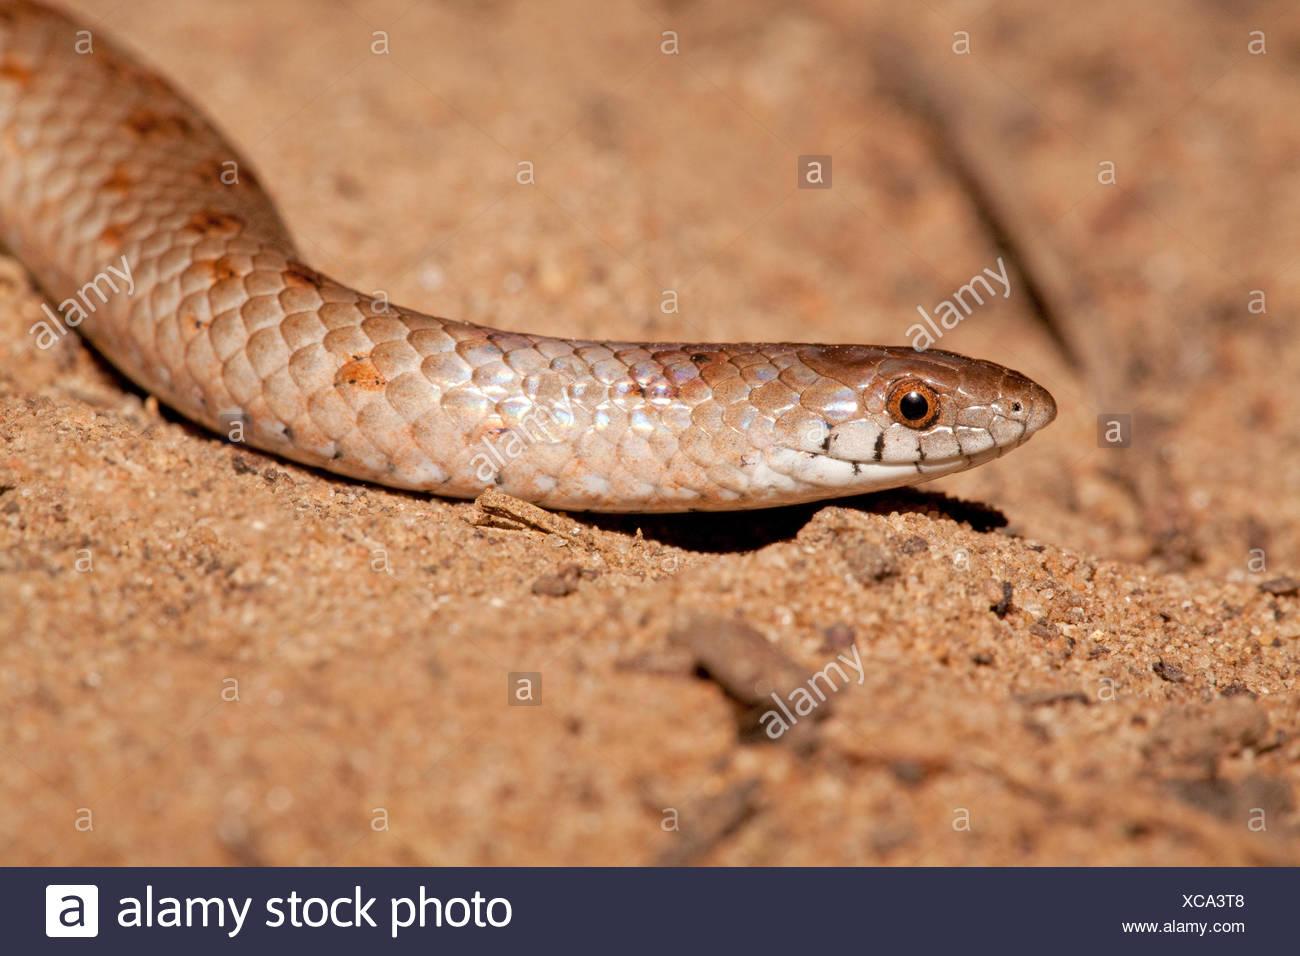 photo of a variegated slug eater - Stock Image